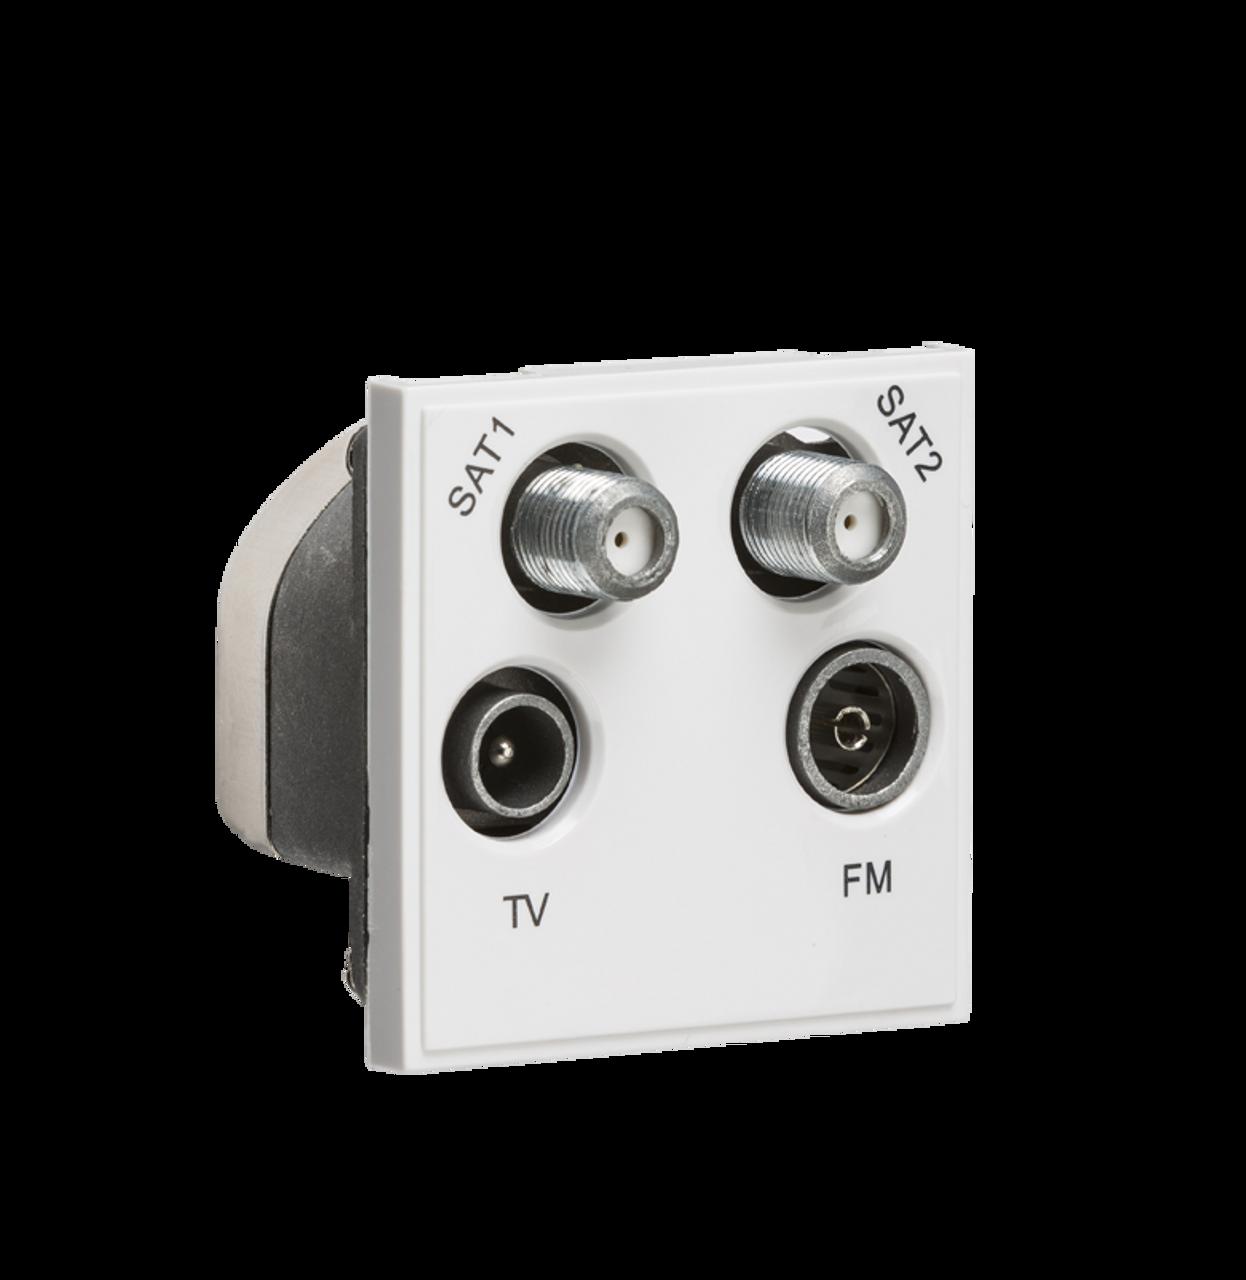 Superb White Modular Quadplexed Sat1 Sat2 Tv Fm Dab Outlet Dfl1Netqdwh Wiring Digital Resources Jebrpkbiperorg